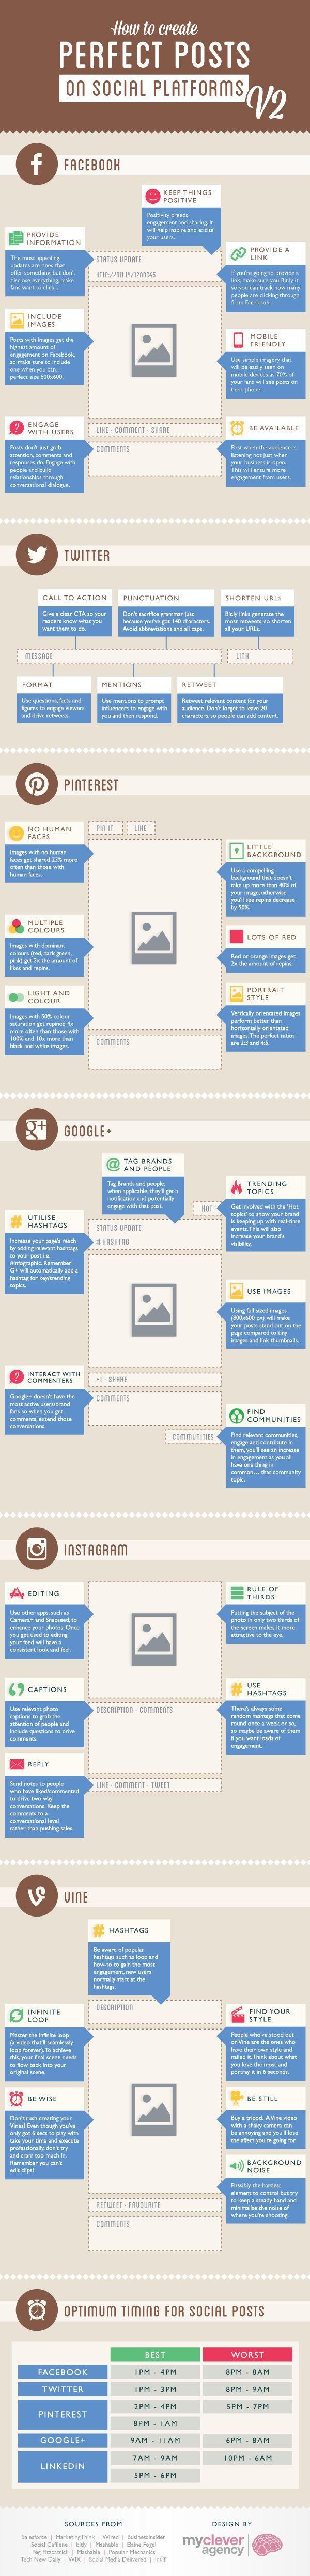 How to make the perfect post on each social media platform-- Facebook, Twitter, Google+, Pinterest, Instagram, and Vine.